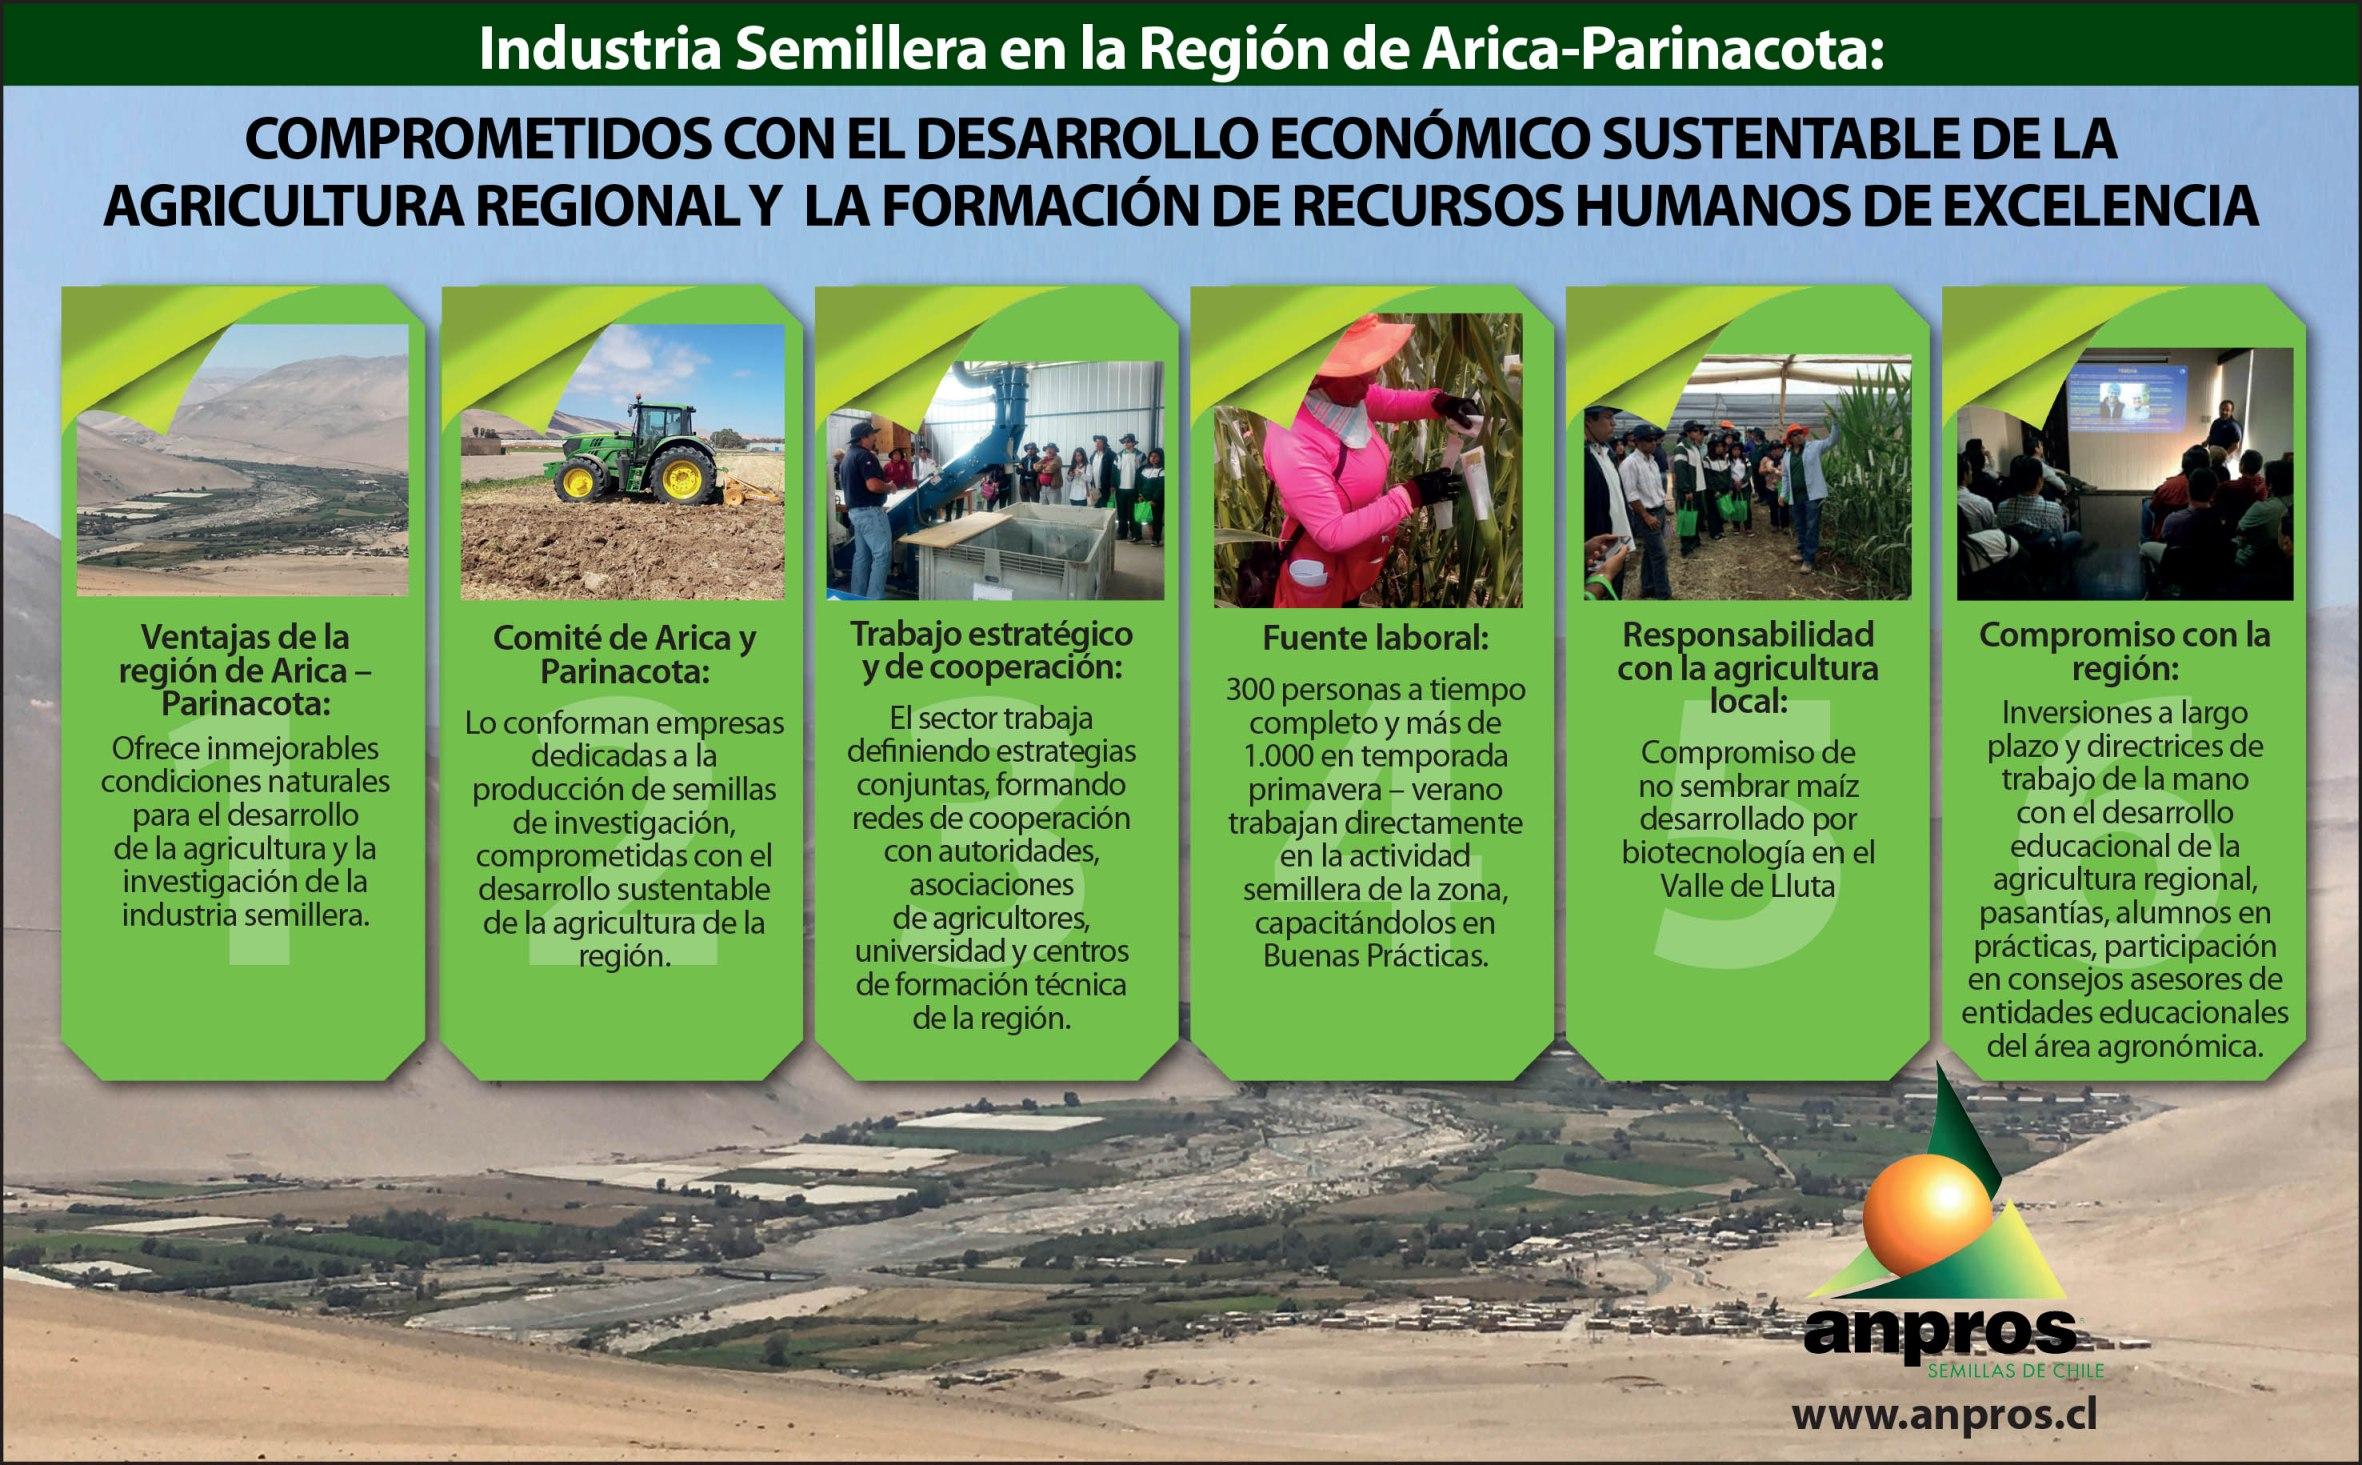 Comité ANPROS Arica-Parinacota presente en suplemento agrícola de Diario La Estrella